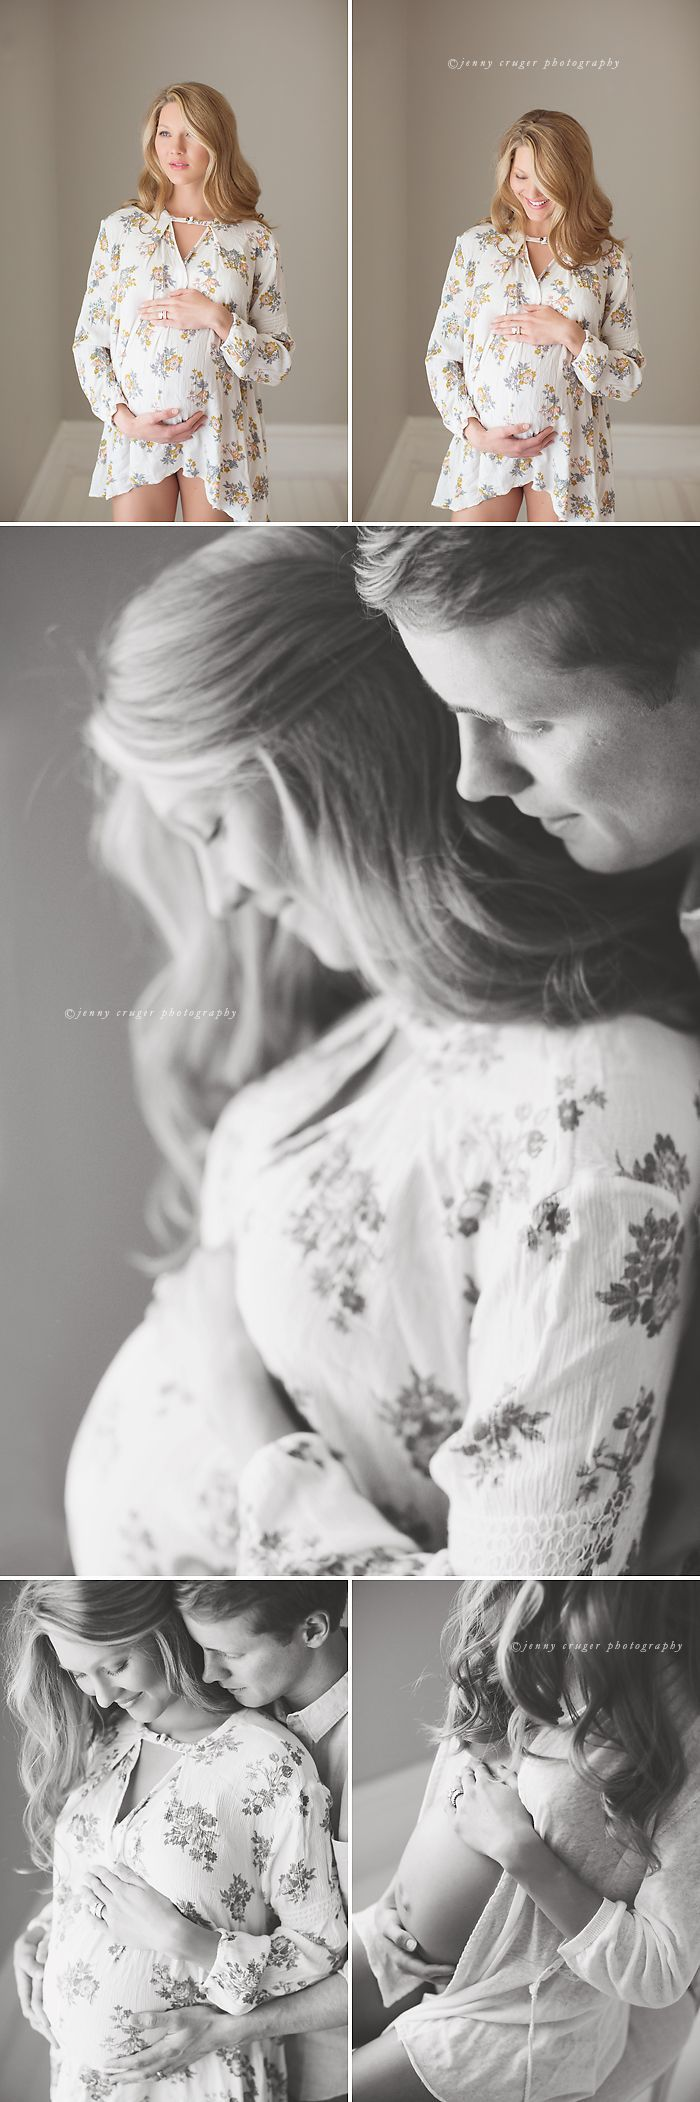 nashville maternity photographer | jenny cruger photography